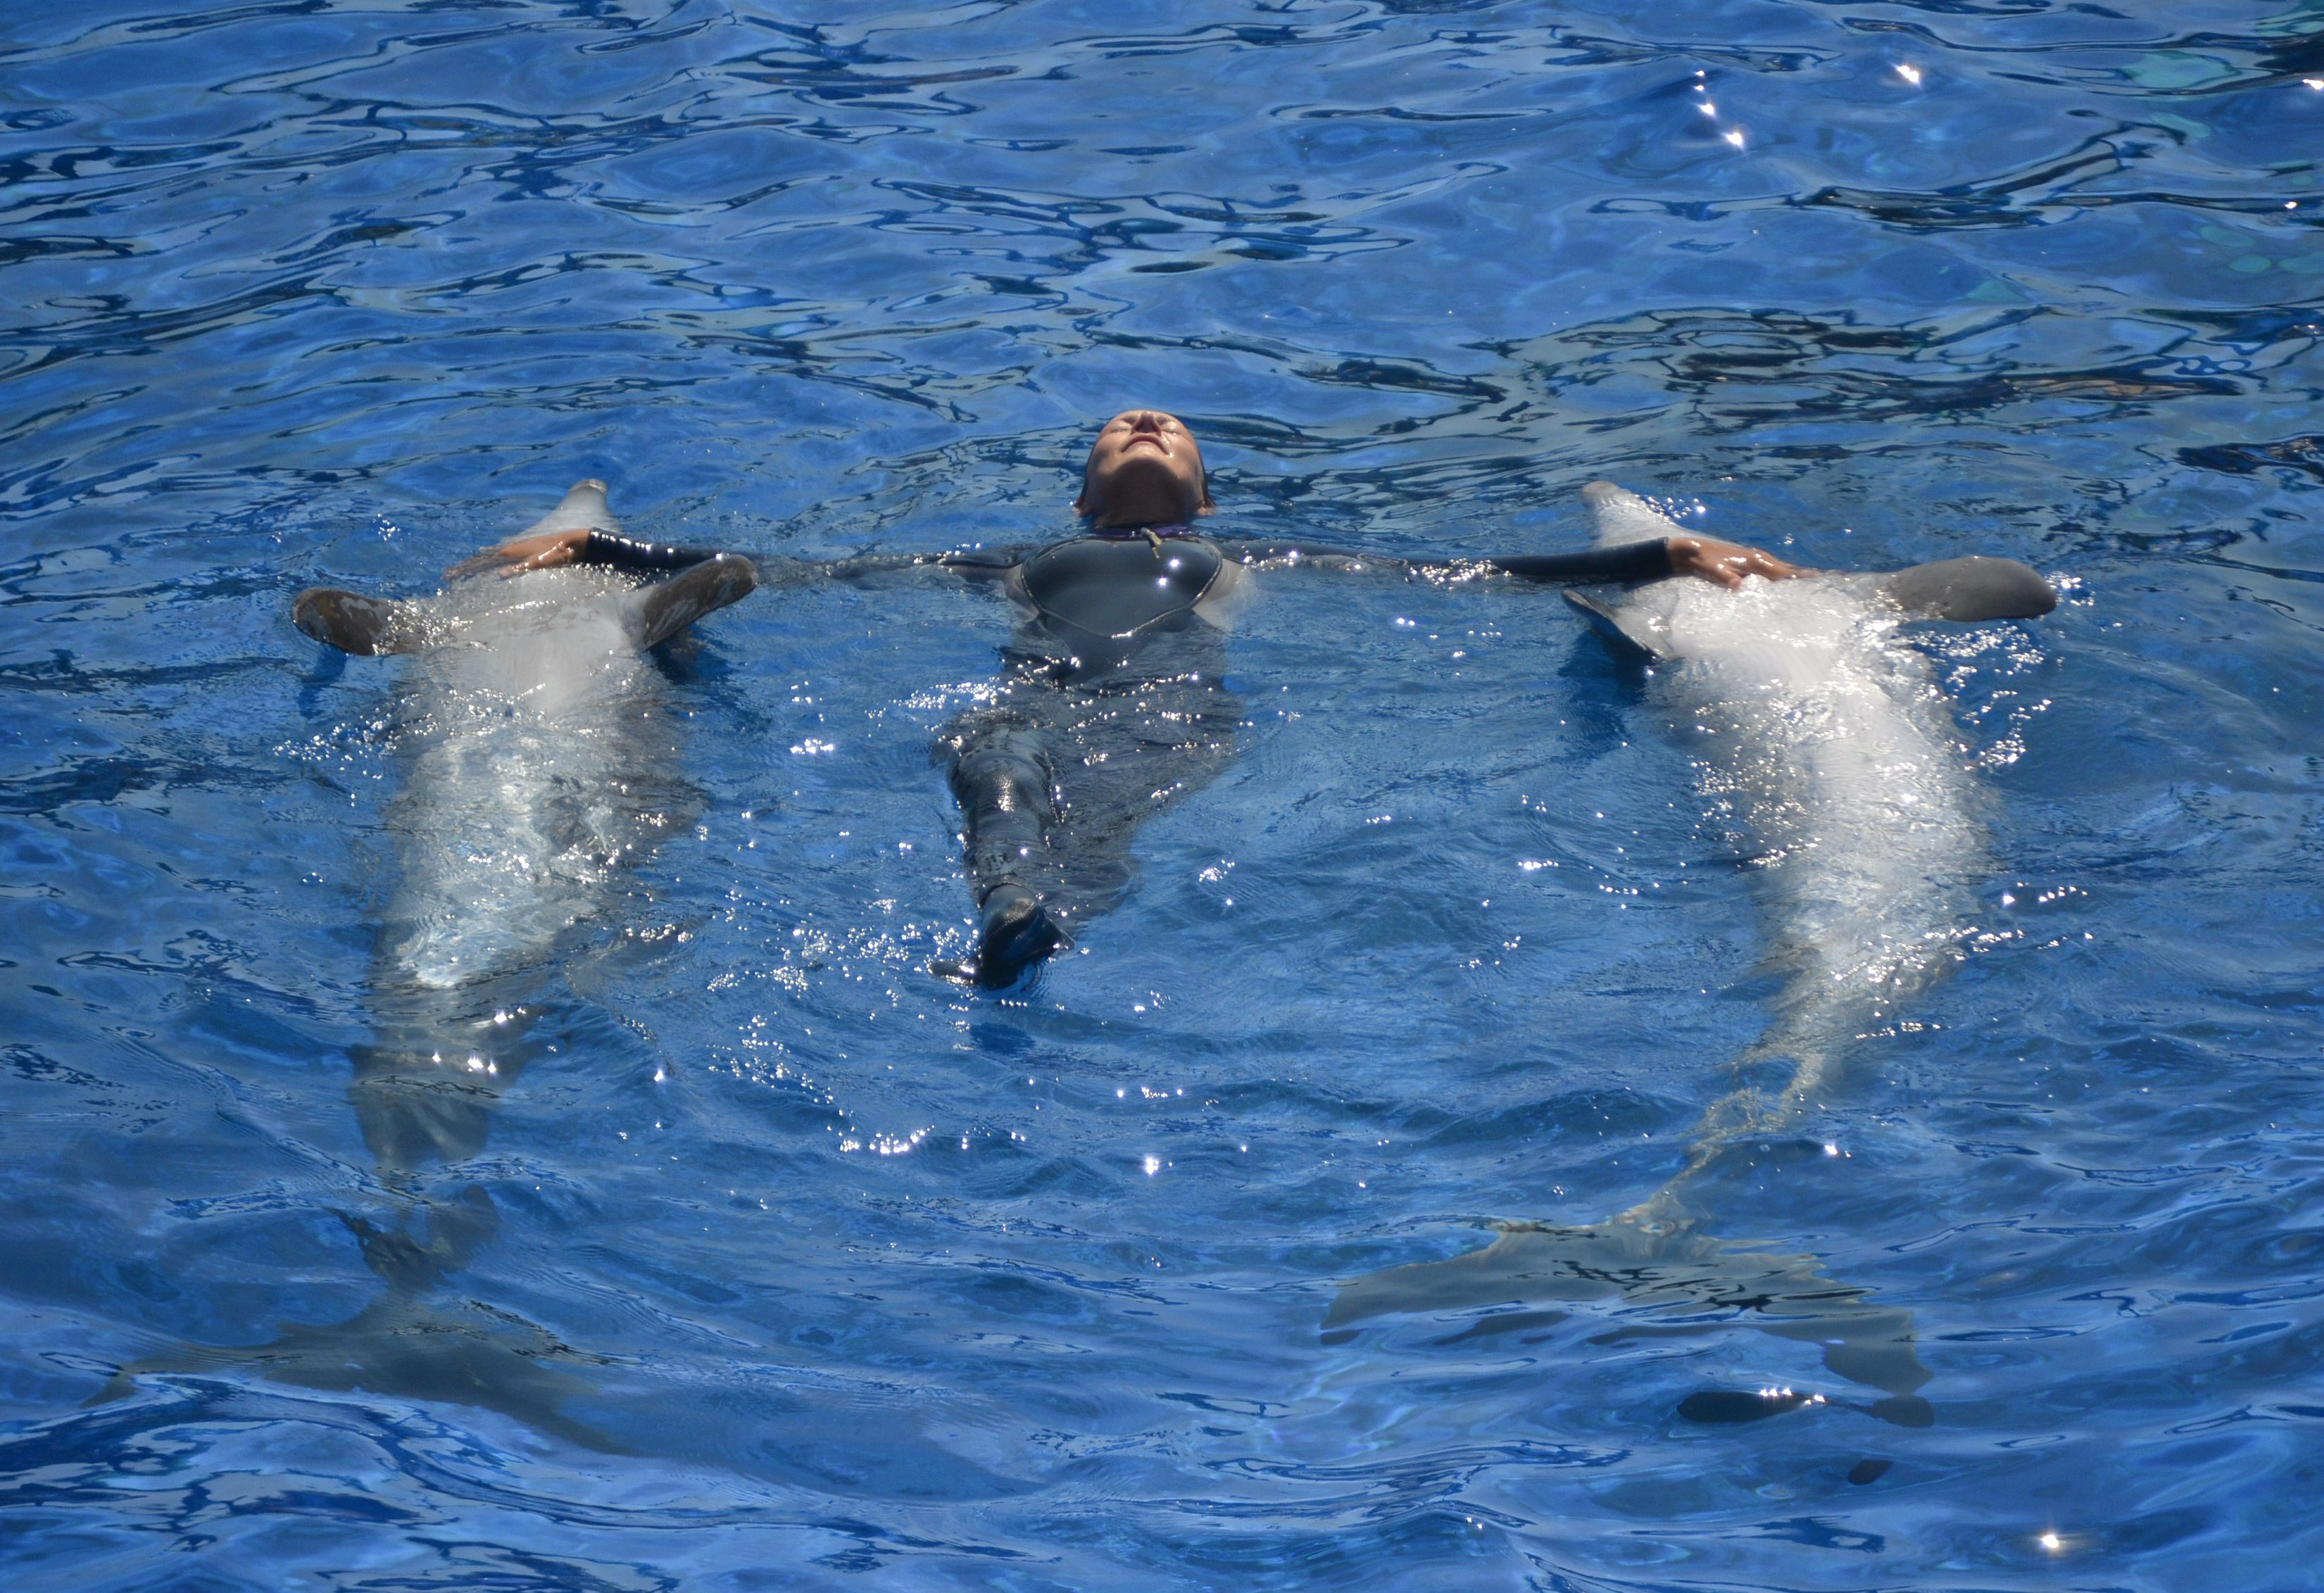 marineland-antibes-une-semaine-a-nice-blog-voyage-les-ptits-touristes-3